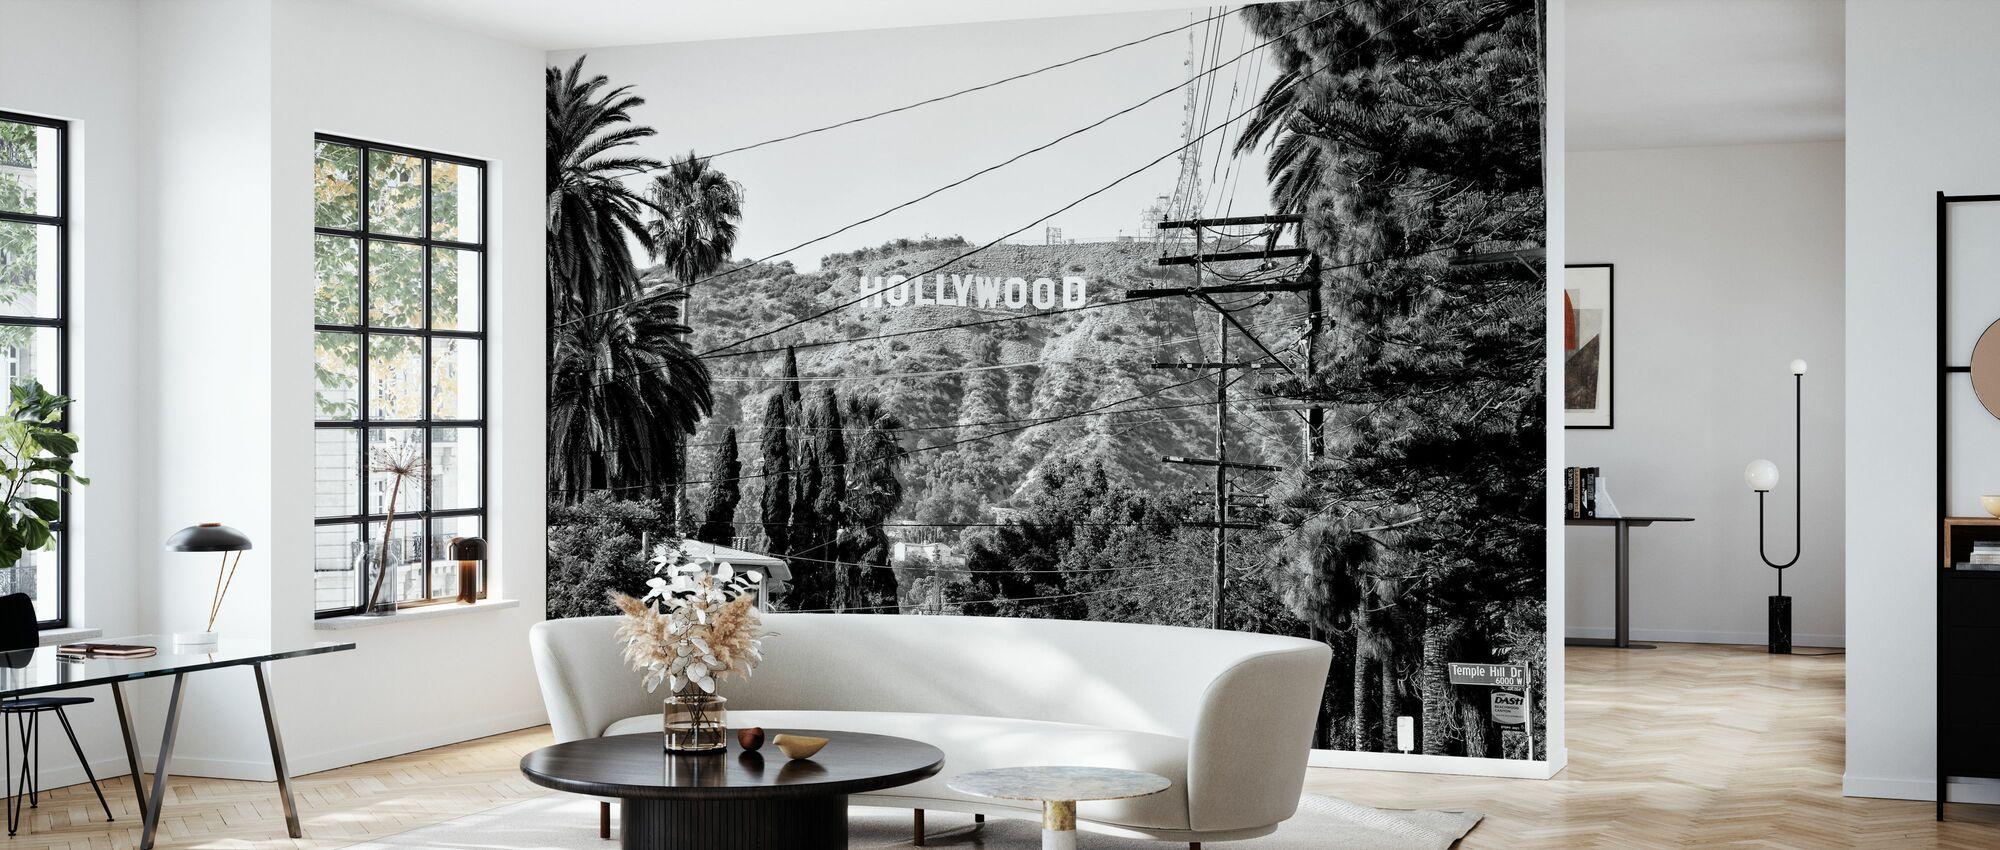 Black California - Hollywood Sign - Wallpaper - Living Room